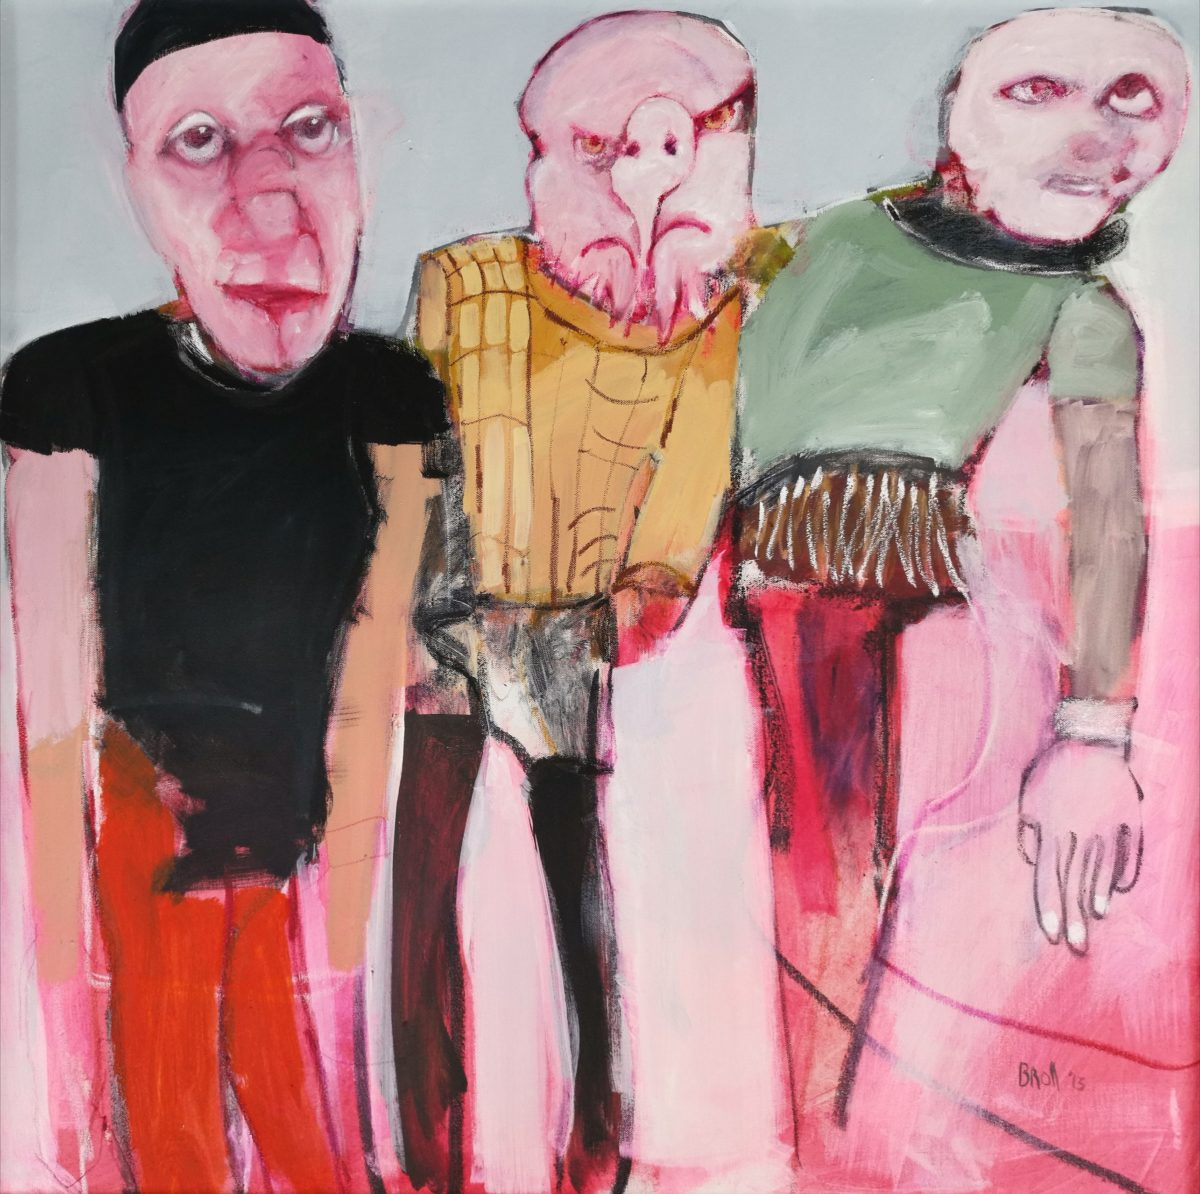 Terri Broll - They sleep with Angels - 2013